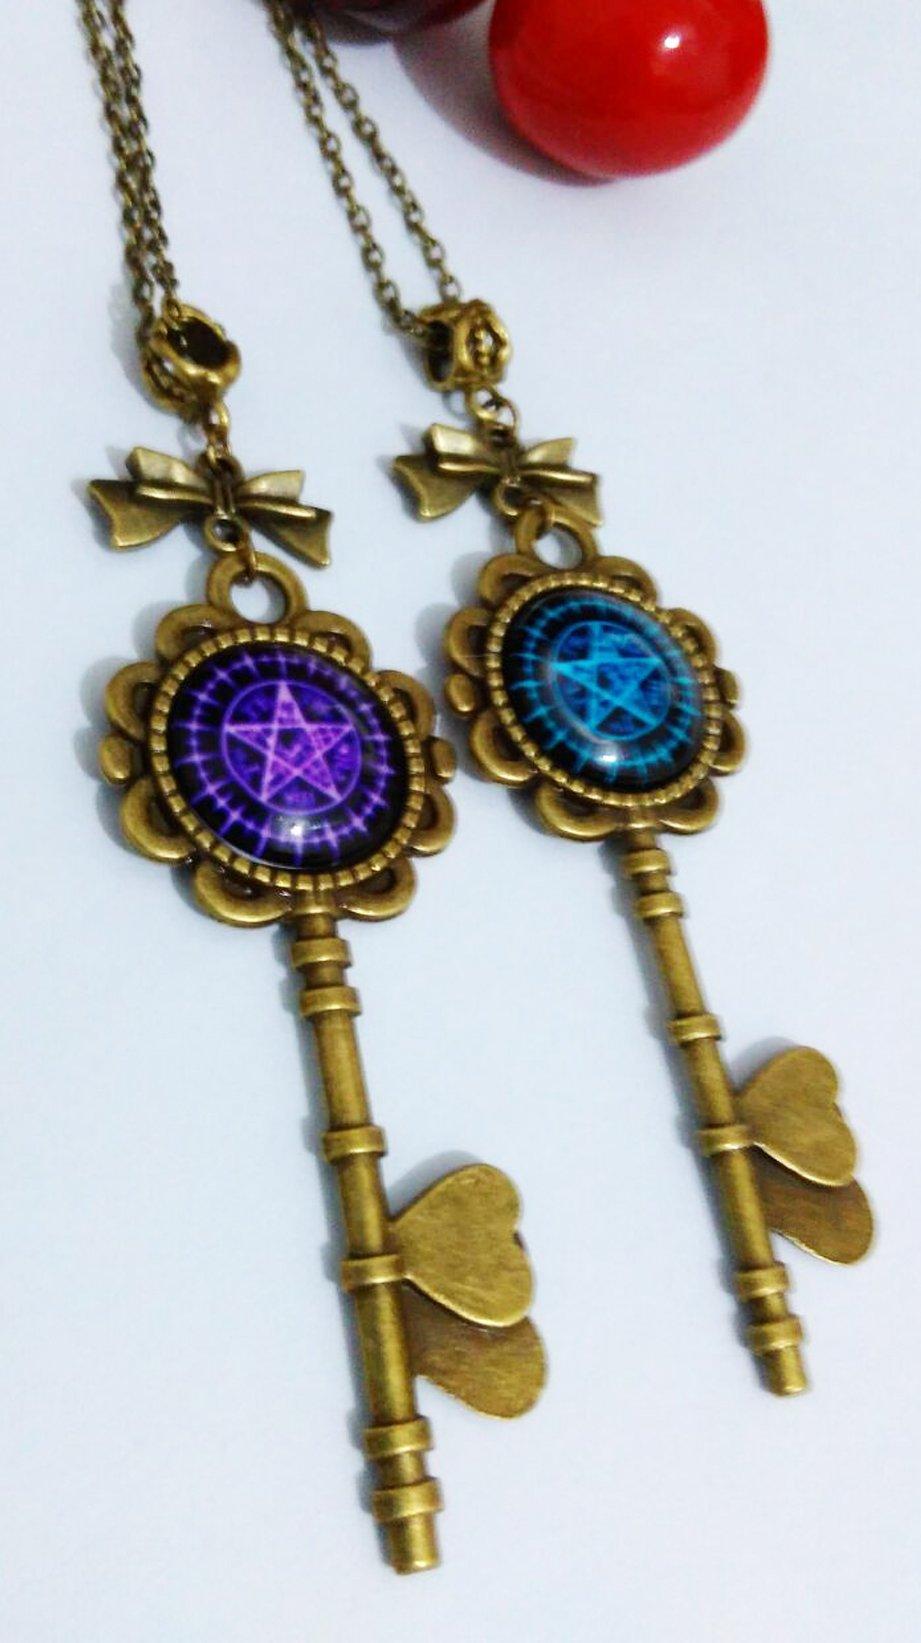 Dreamcosplay Black Butler Magic Symbol Key Necklace 2PCS